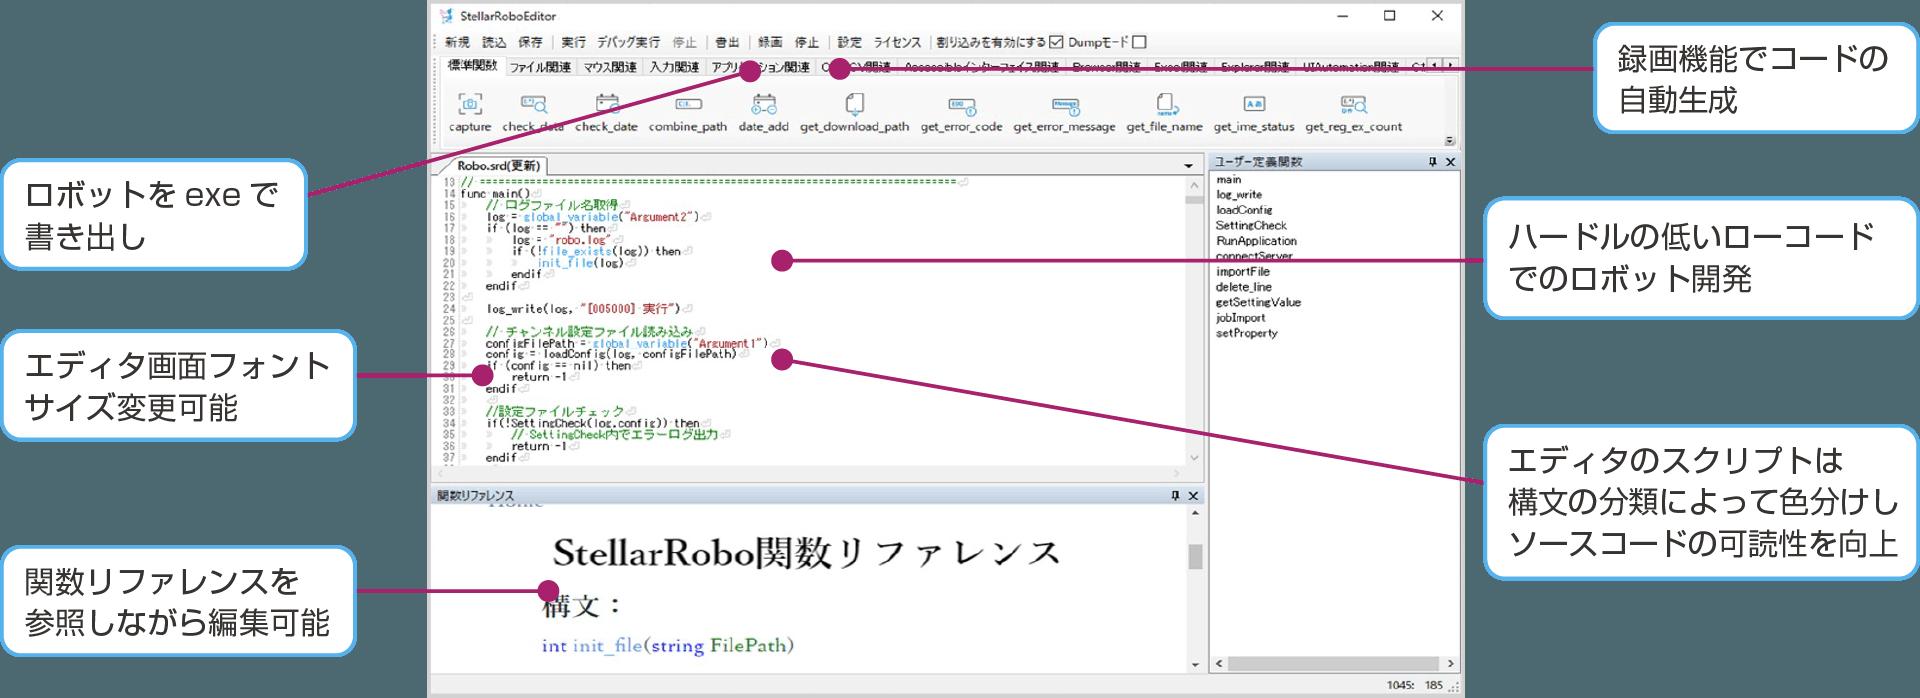 StellarRobo Editor画面